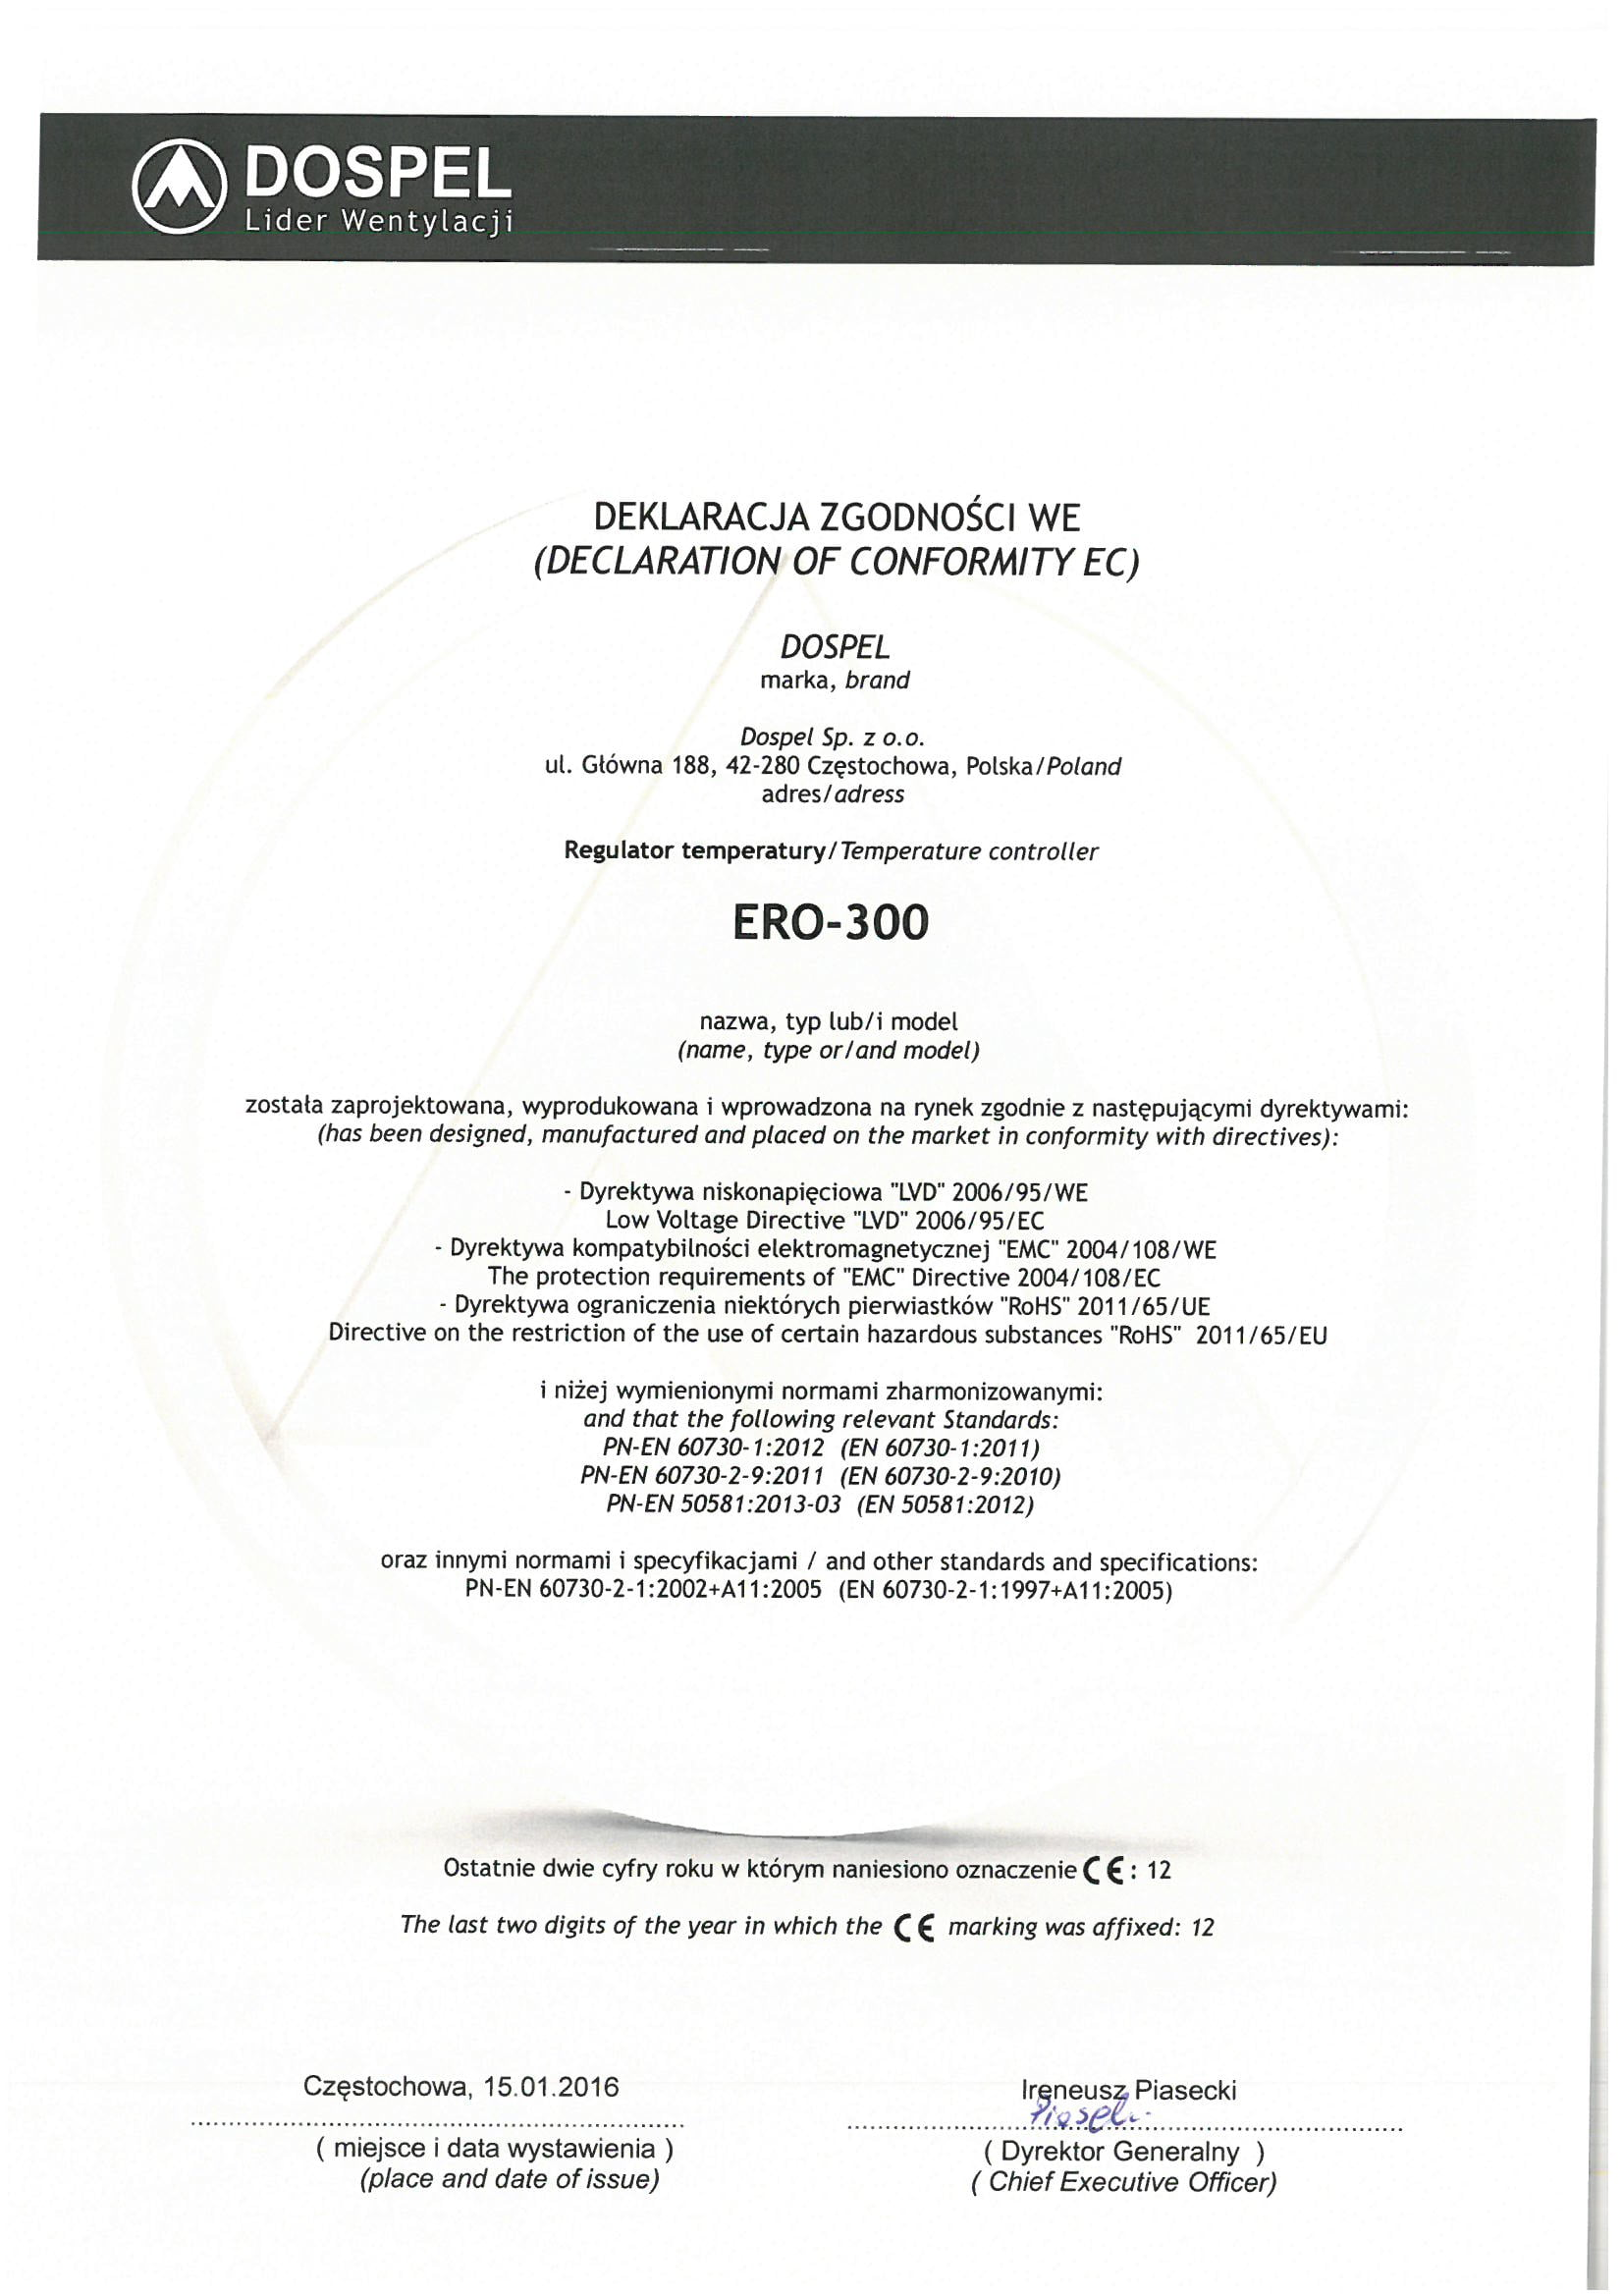 Regulator temperatury, ero-300, certyfikat, deklaracja zgodności, producent wentylatorów, Dospel